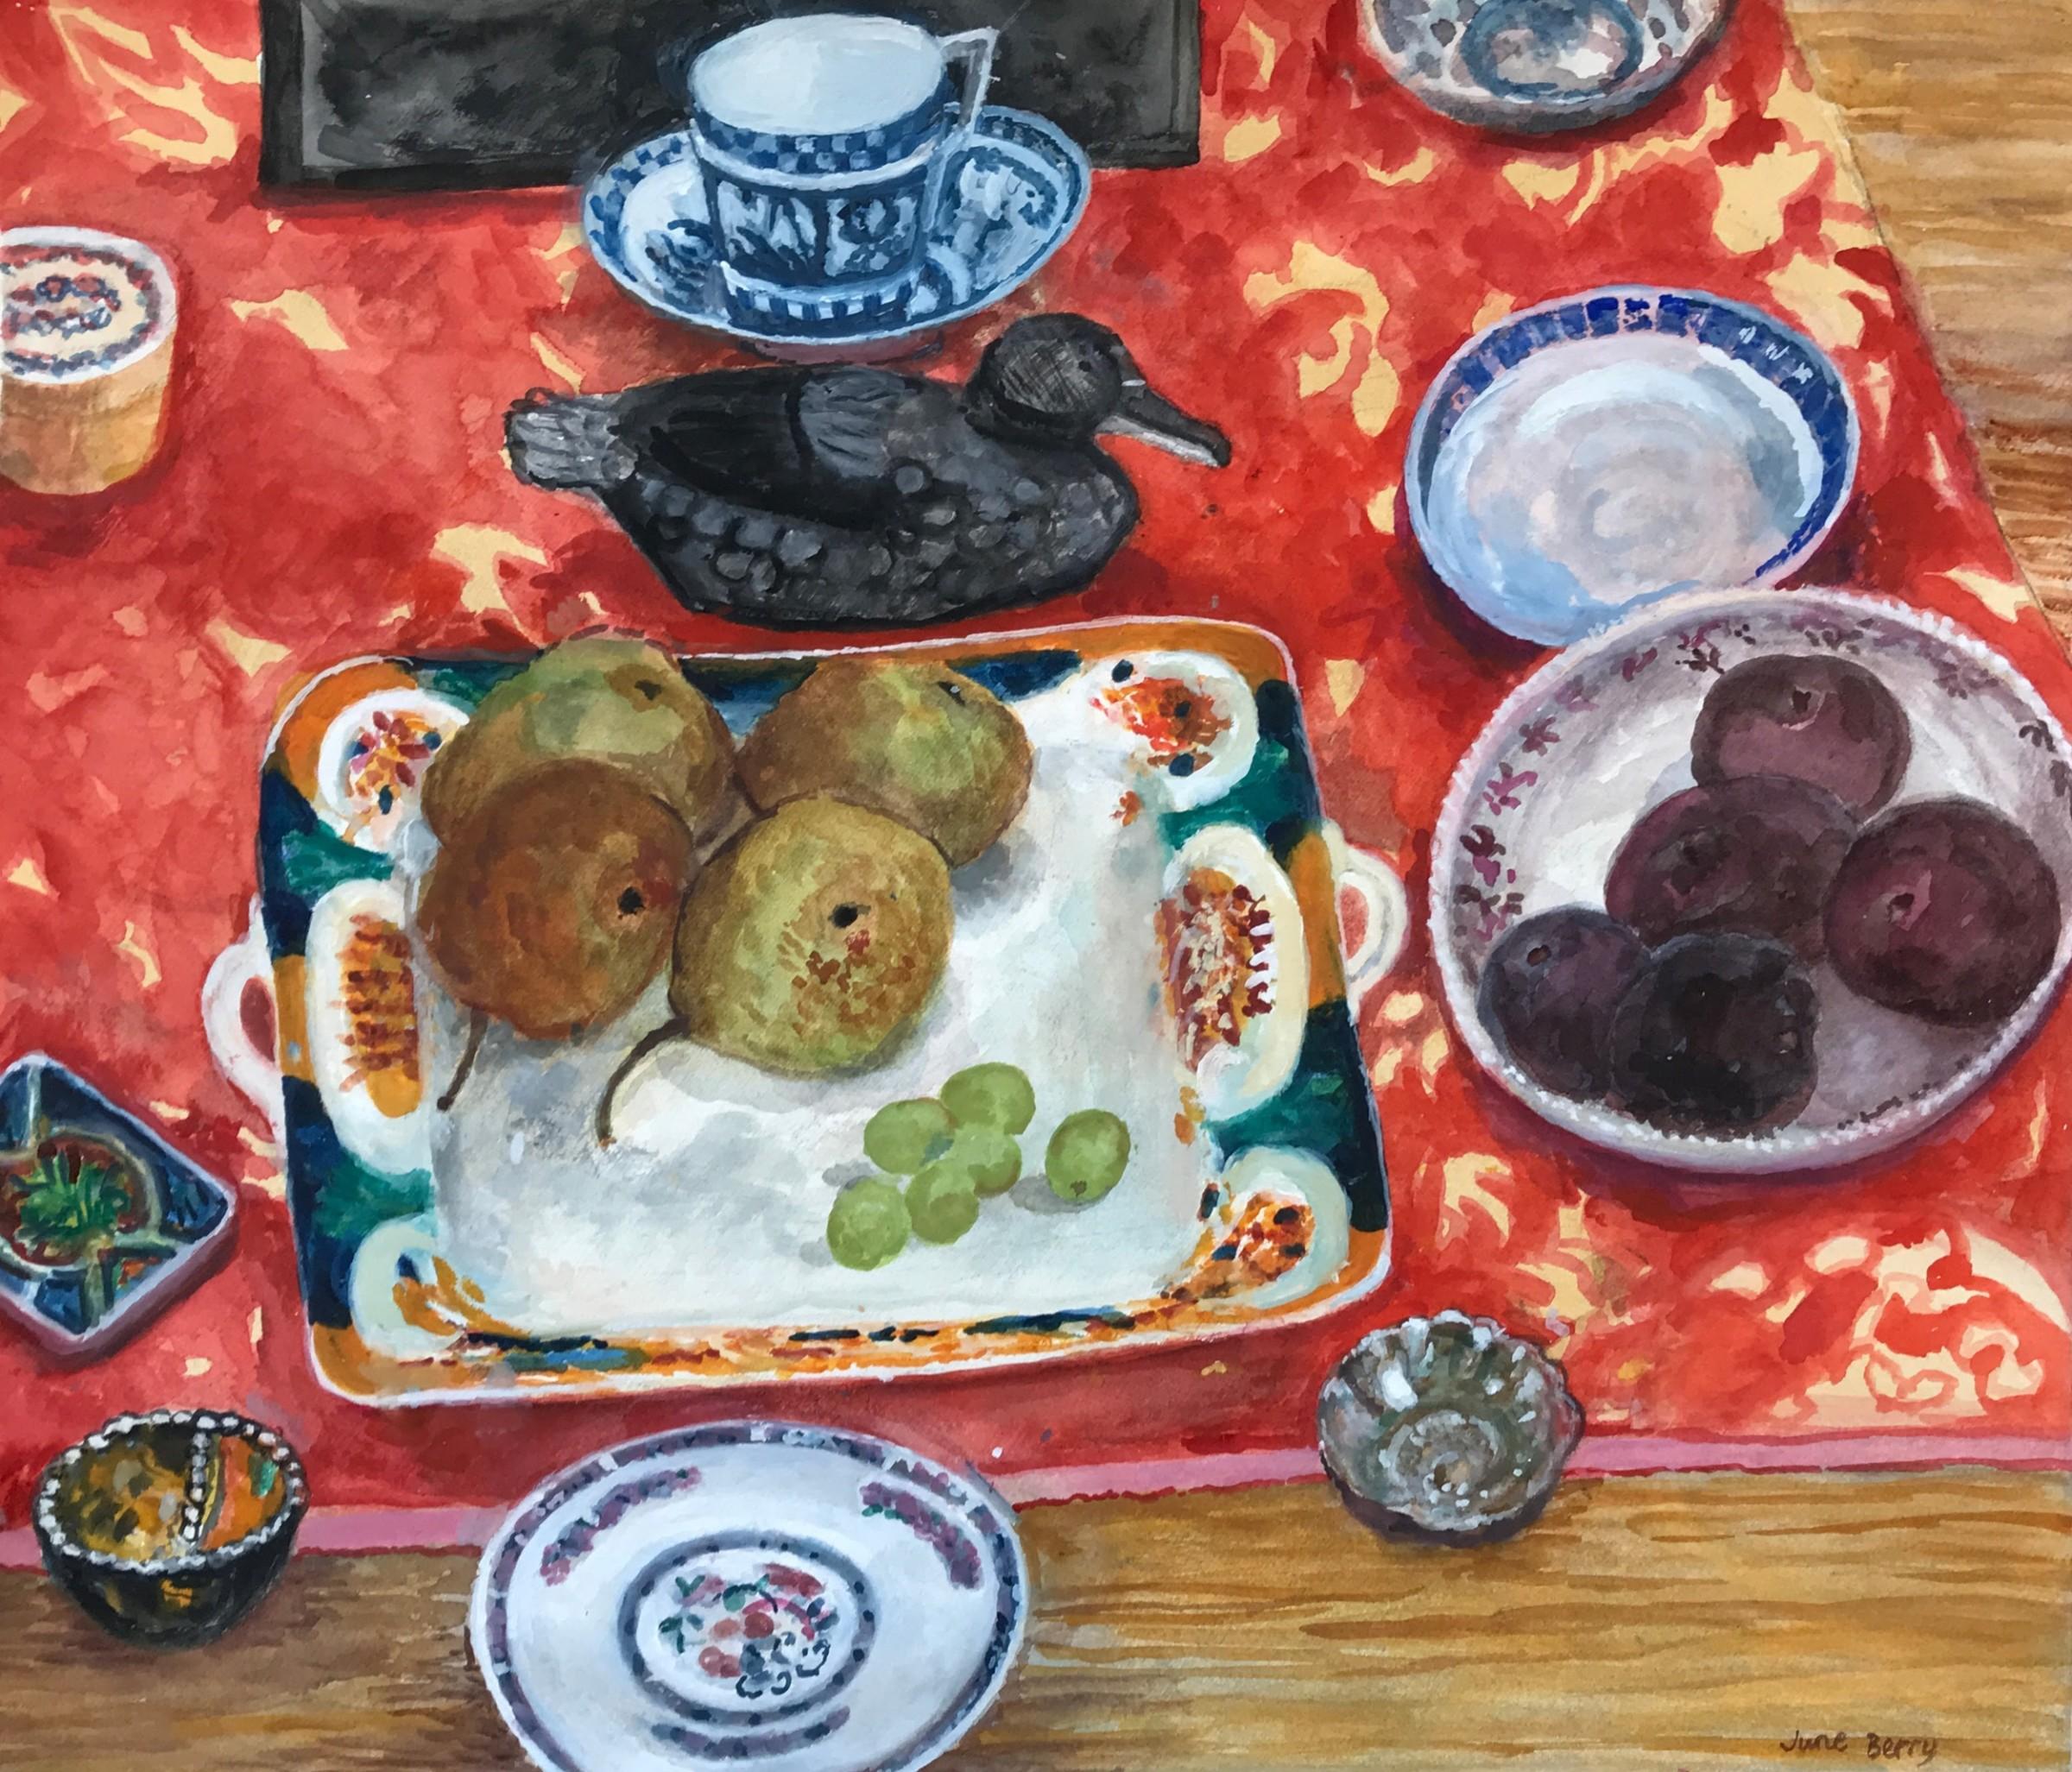 "<span class=""link fancybox-details-link""><a href=""/artists/40-june-berry/works/12651-june-berry-the-red-cloth/"">View Detail Page</a></span><div class=""artist""><span class=""artist""><strong>June Berry</strong></span></div><div class=""title""><em>The Red Cloth</em></div><div class=""medium"">watercolour</div><div class=""dimensions"">Artwork: 52 x 44cm</div><div class=""price"">£1,040.00</div>"